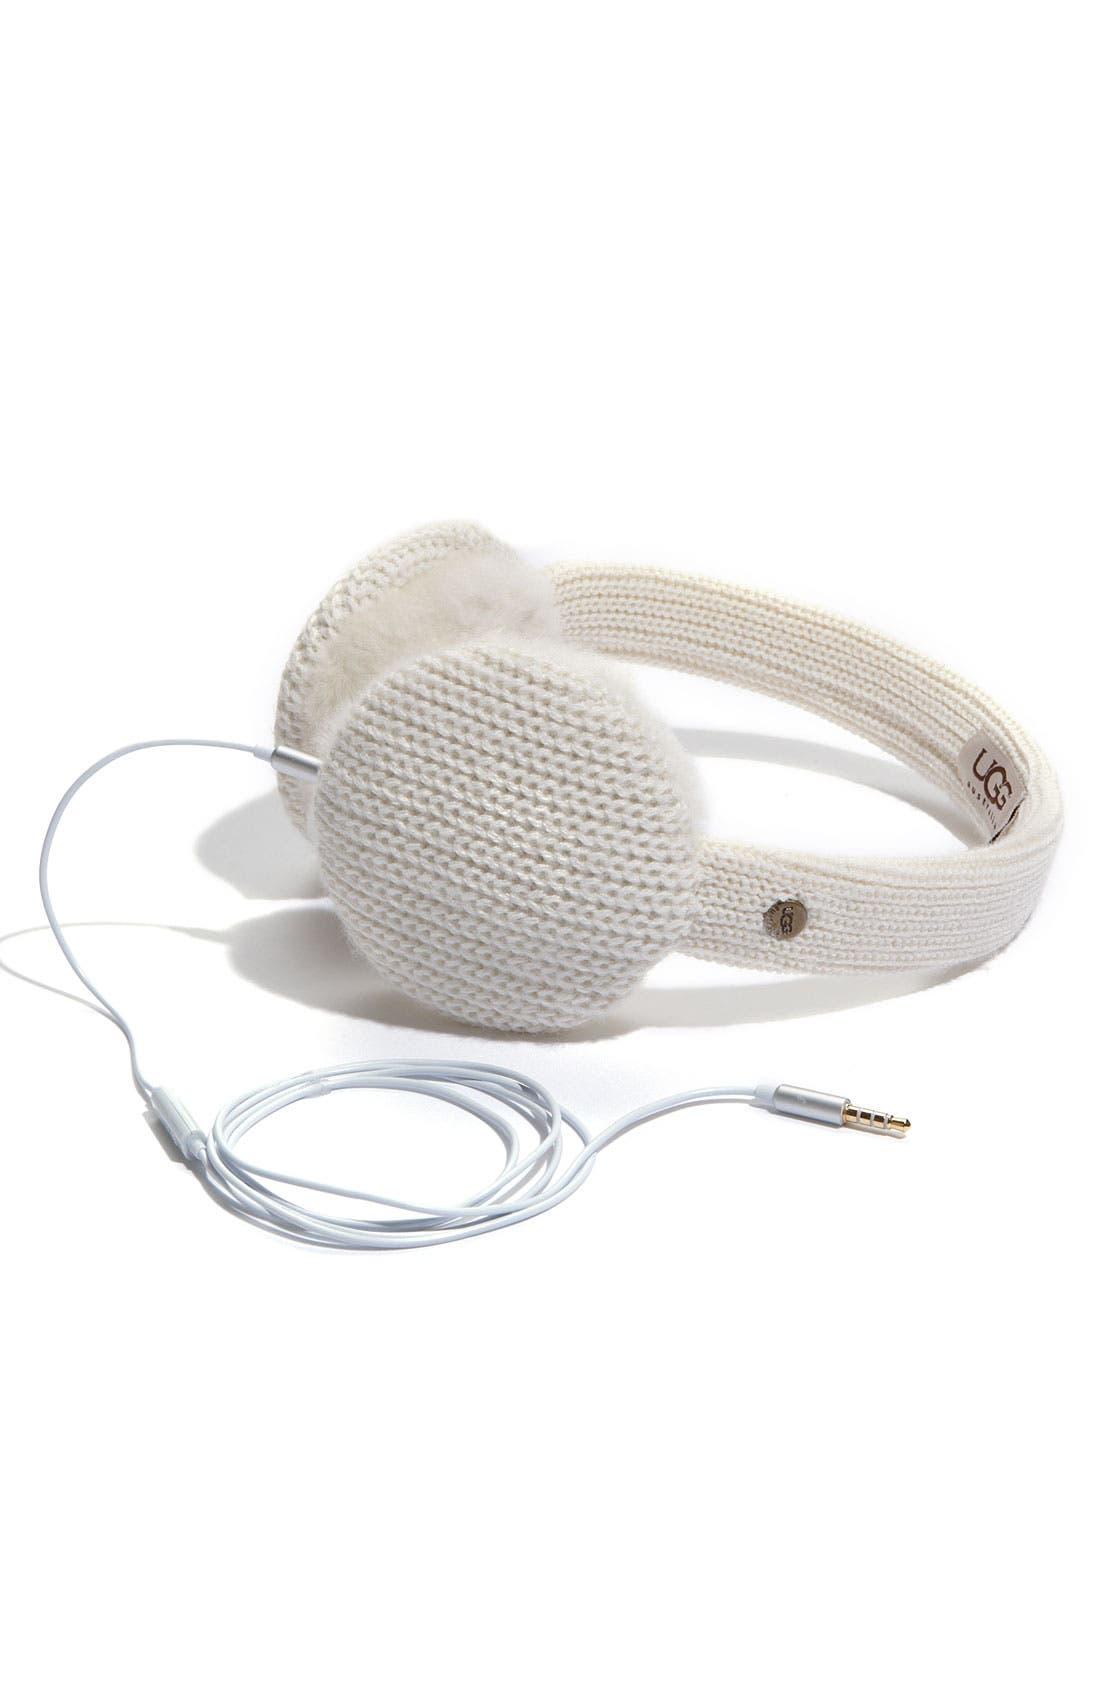 Alternate Image 1 Selected - Ugg® Australia Headphone Earmuffs (Nordstrom Exclusive)